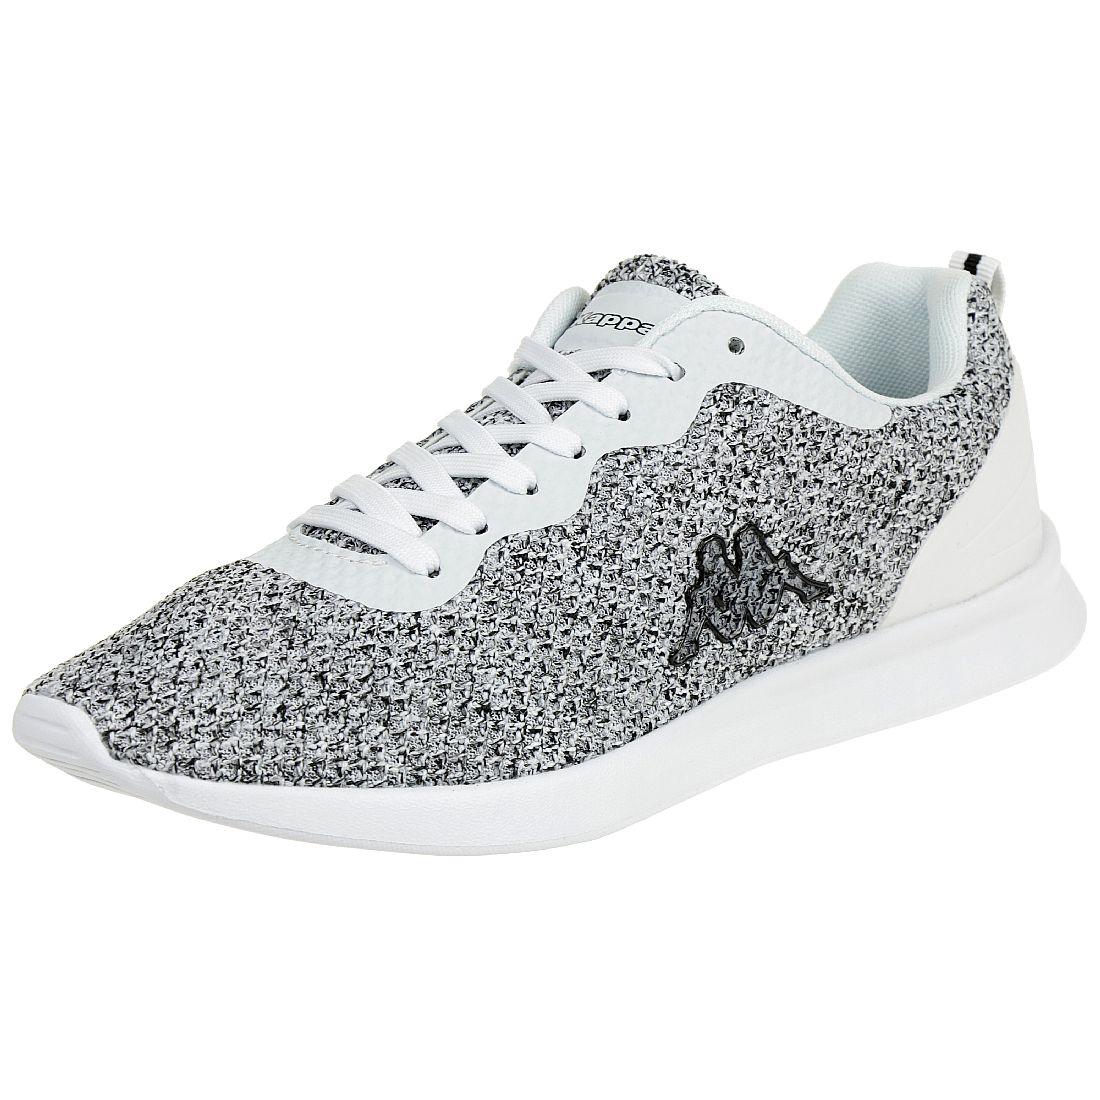 7f4cc8a74c625e Kappa Hover Damen Sneaker Turnschuhe Schuhe weiss schwarz 37 EU von Kappa